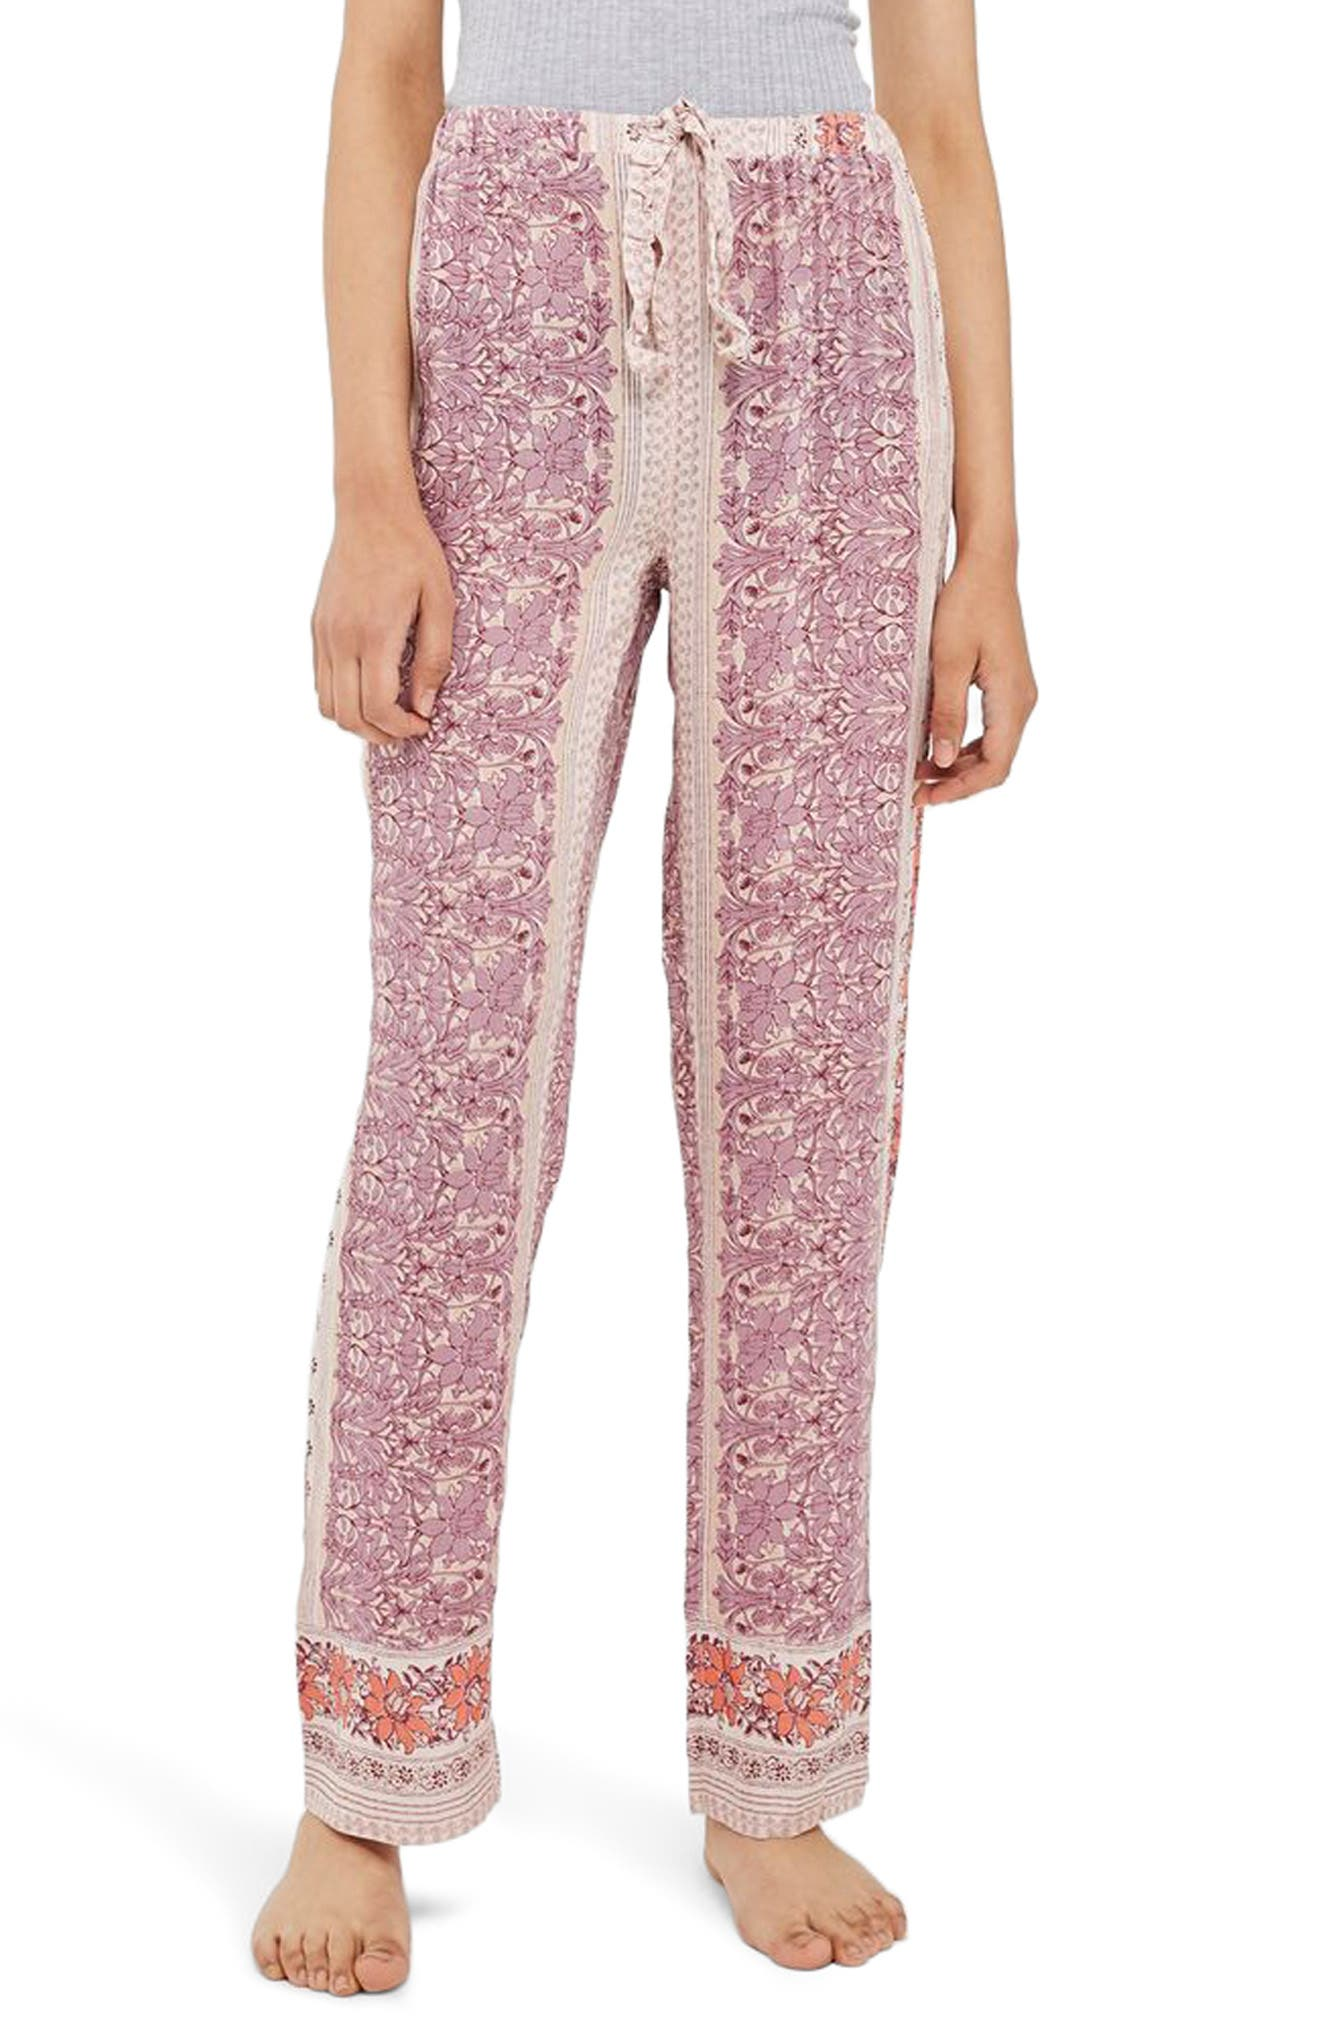 Bohemian Floral Print Pajama Pants,                             Main thumbnail 1, color,                             Lilac Multi